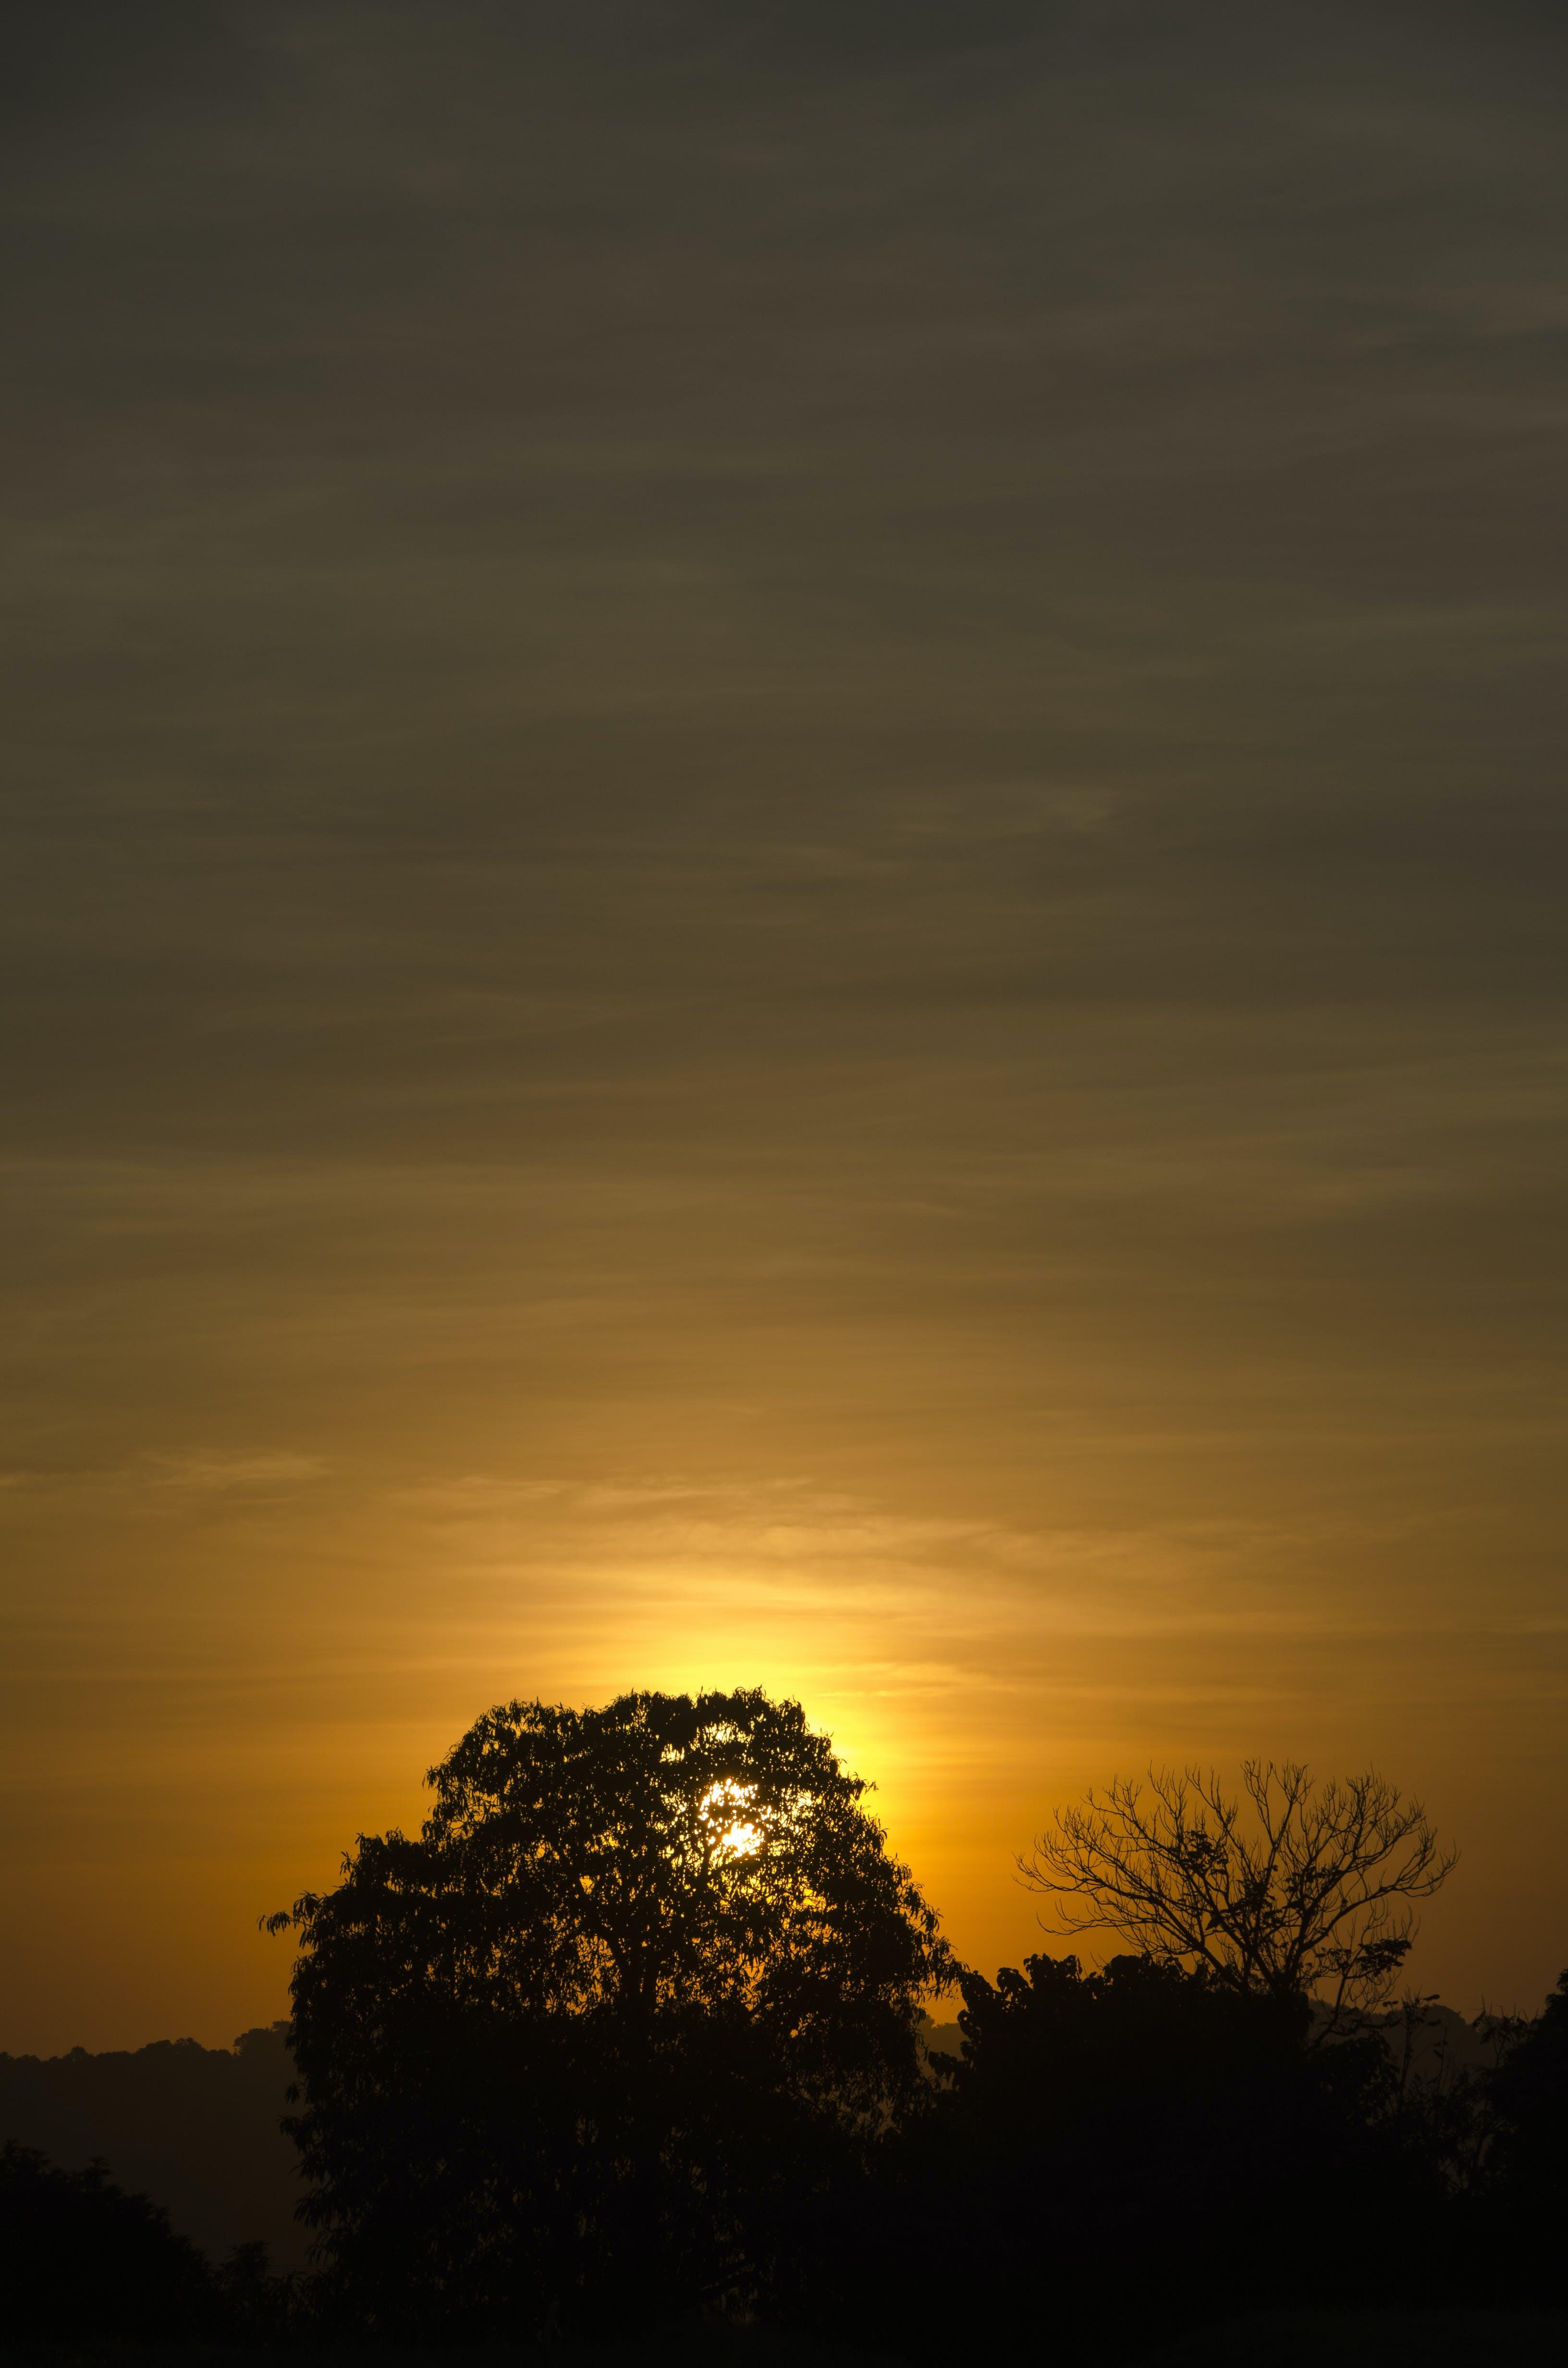 Kostenloses Stock Foto zu bäume, himmel, sonnenaufgang, sonnenuntergang